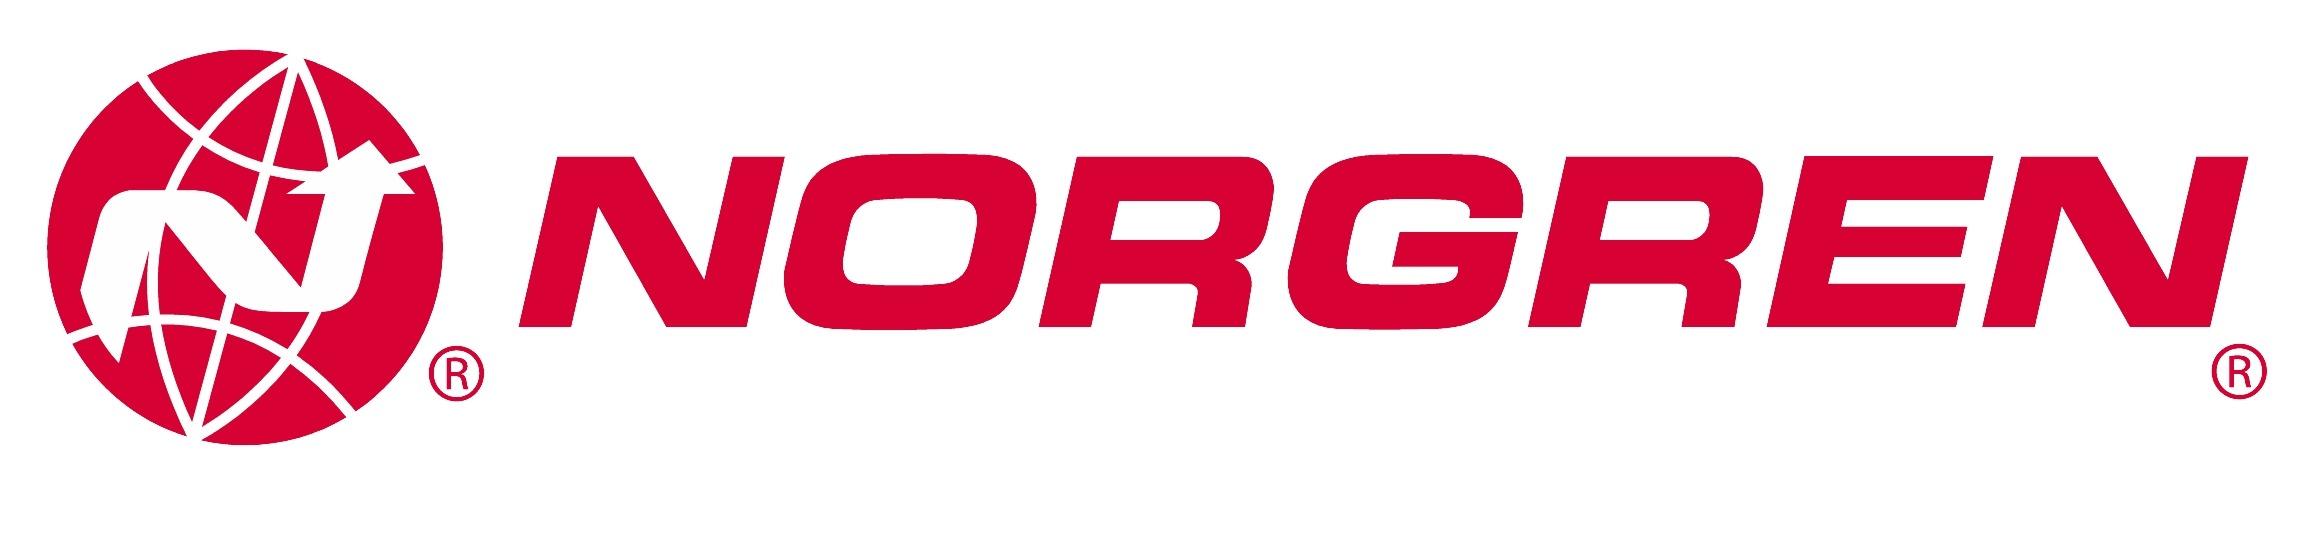 DR_L_Norgenlogo_regmark